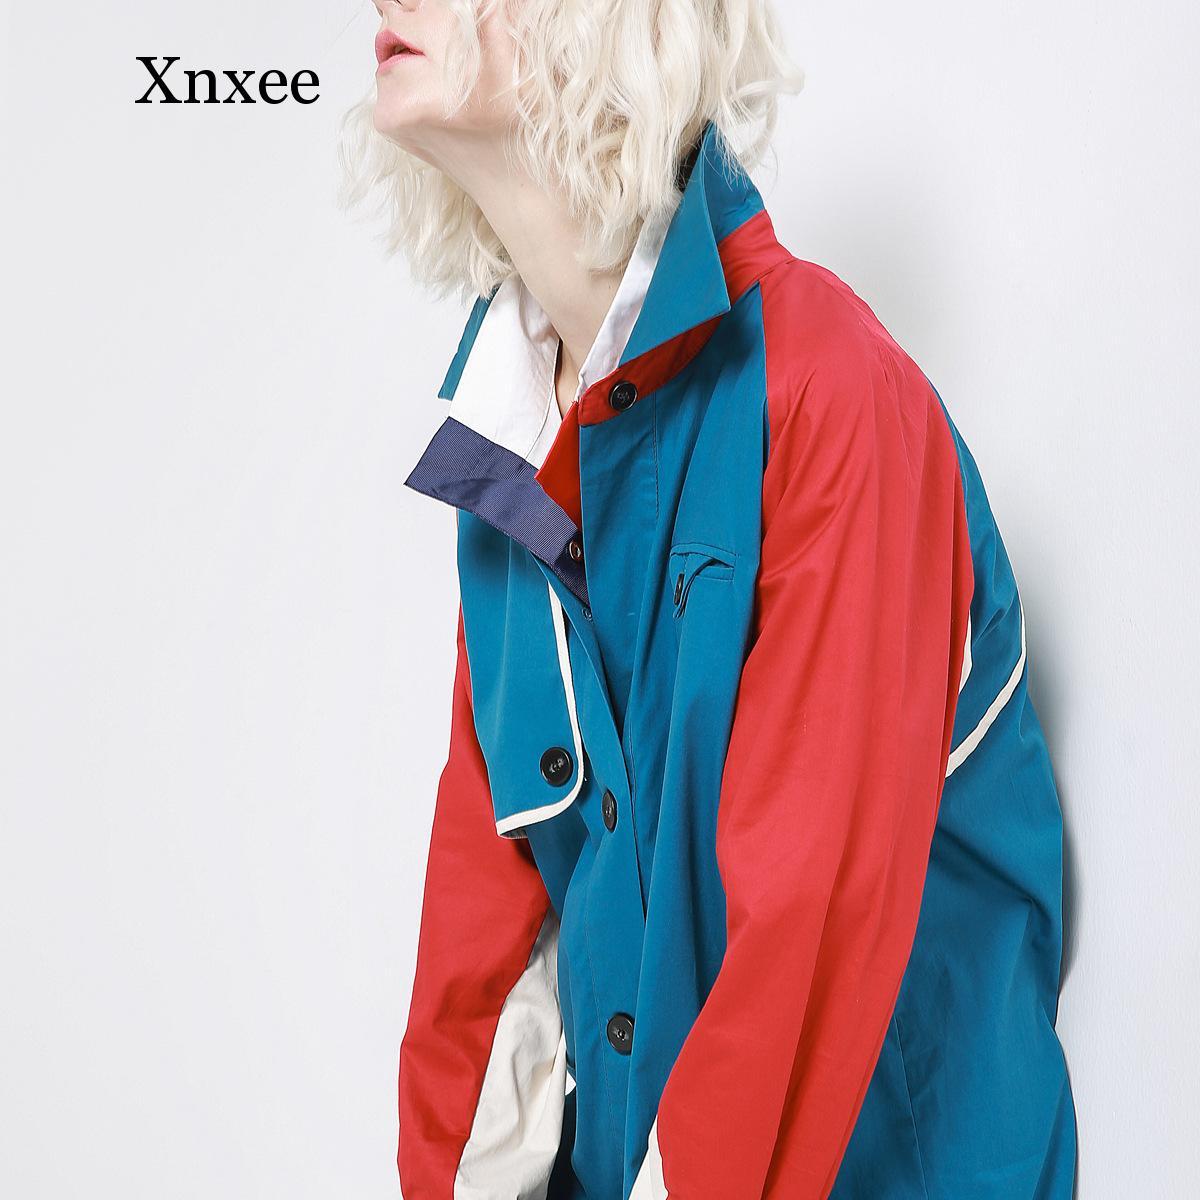 Xnxee Women   Trench   Coat Patchwork Cotton Windbreakers Long Sleeve Single Breasted Long Coat Loose Female Overcoat Autumn 2019